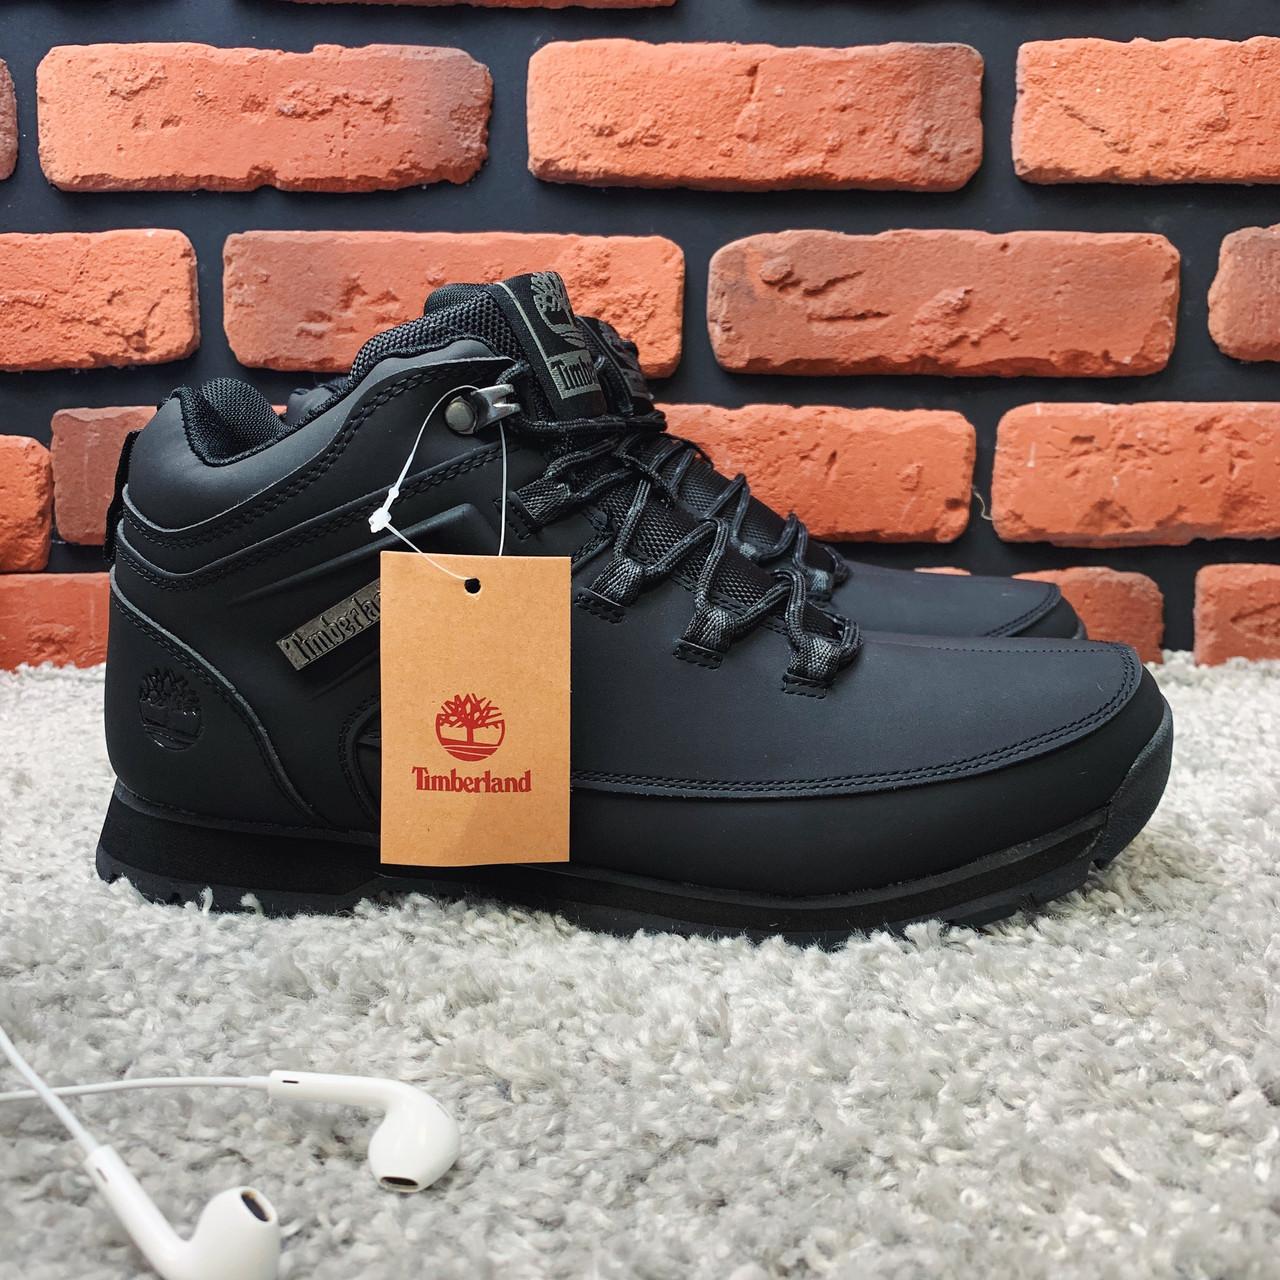 Зимние ботинки (на меху) мужские Timberland  11-004 ⏩ [ 41,42,44,45,46 ]